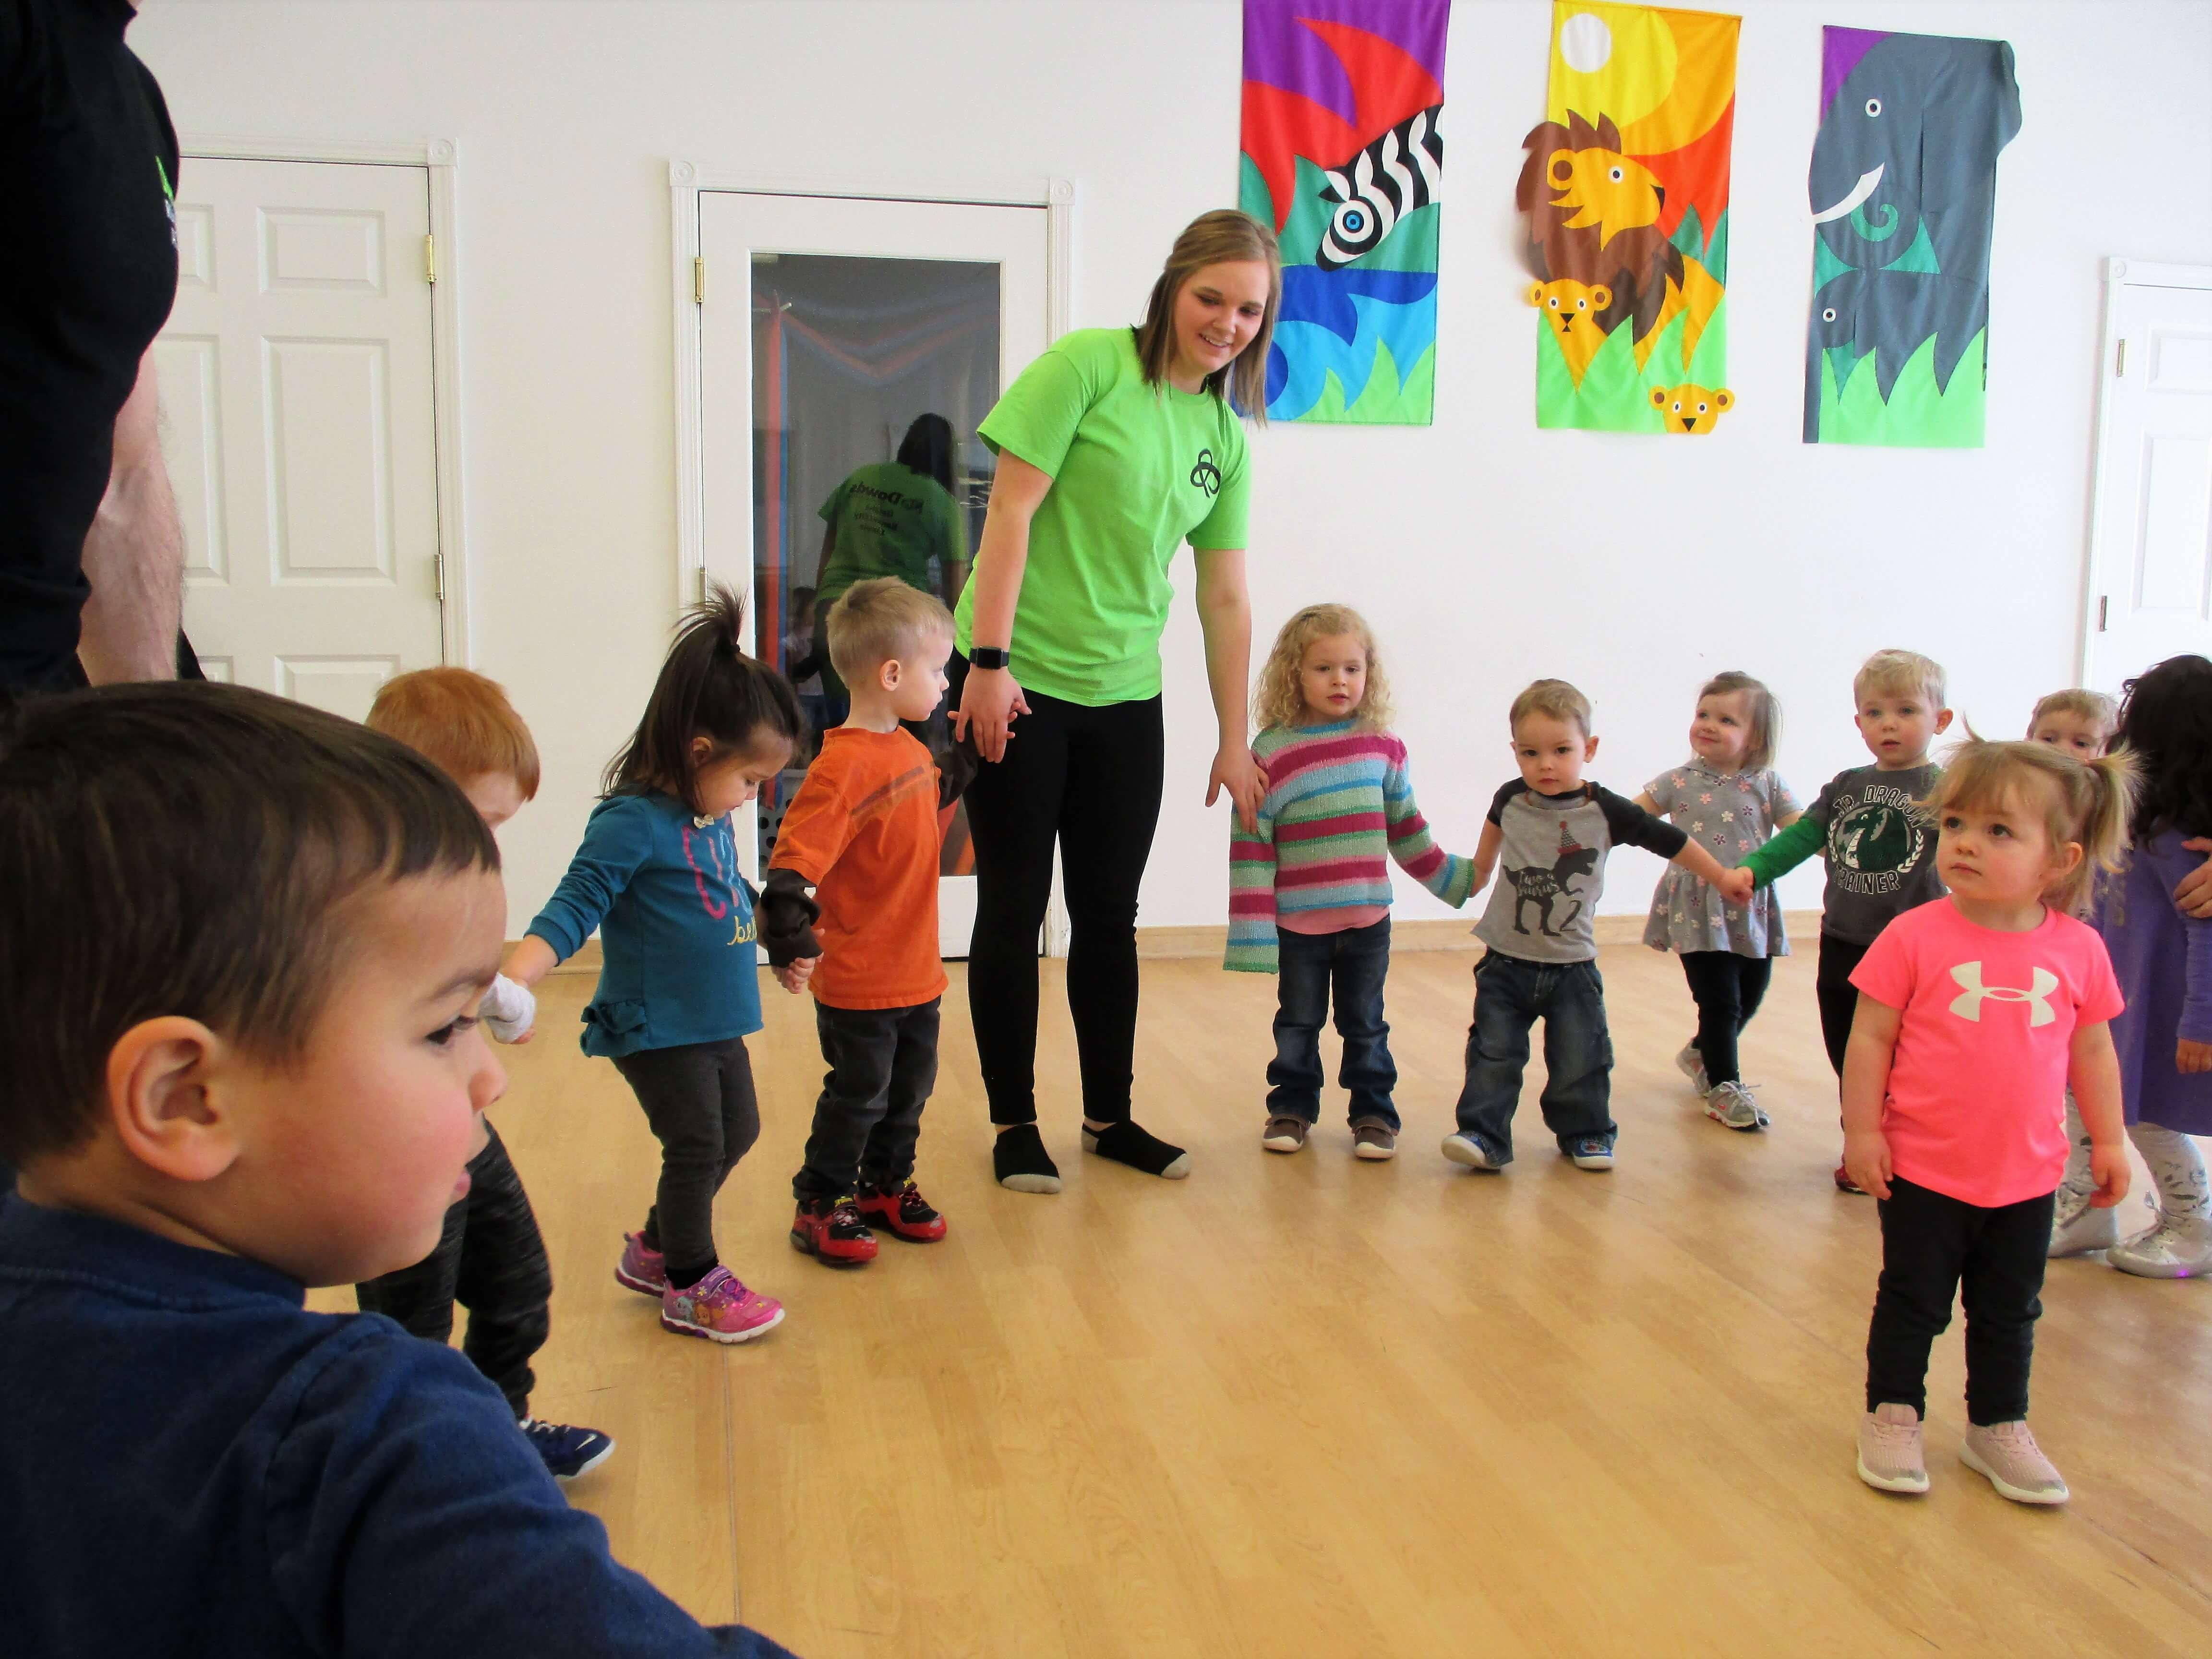 Preschool teacher holding hands with children in a circle